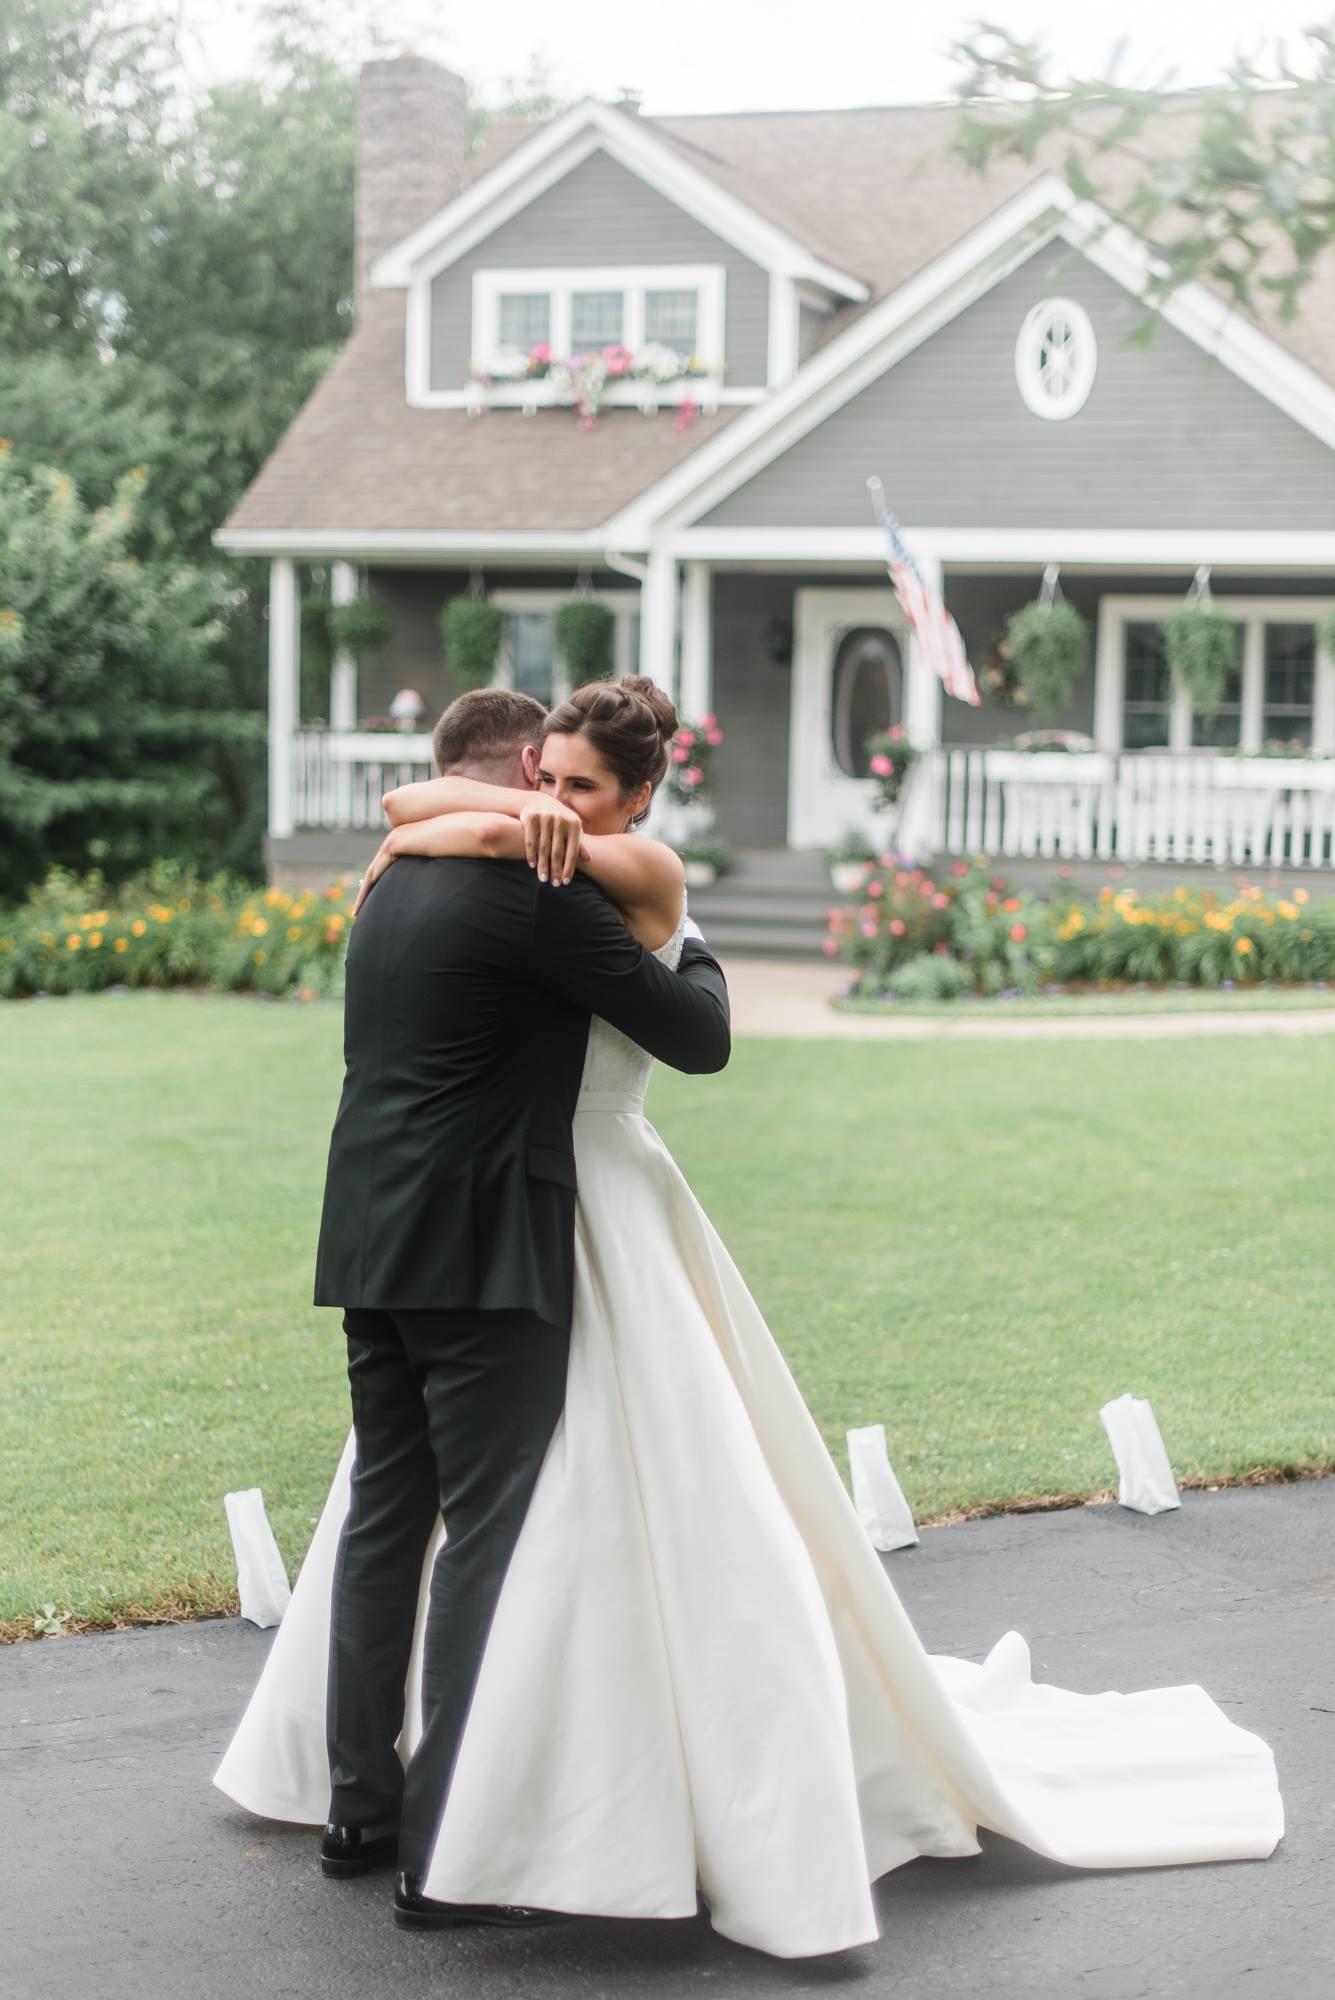 pittsburgh-pennsylvania-backyard-glam-chic-modern-classic-wedding-0011.jpg